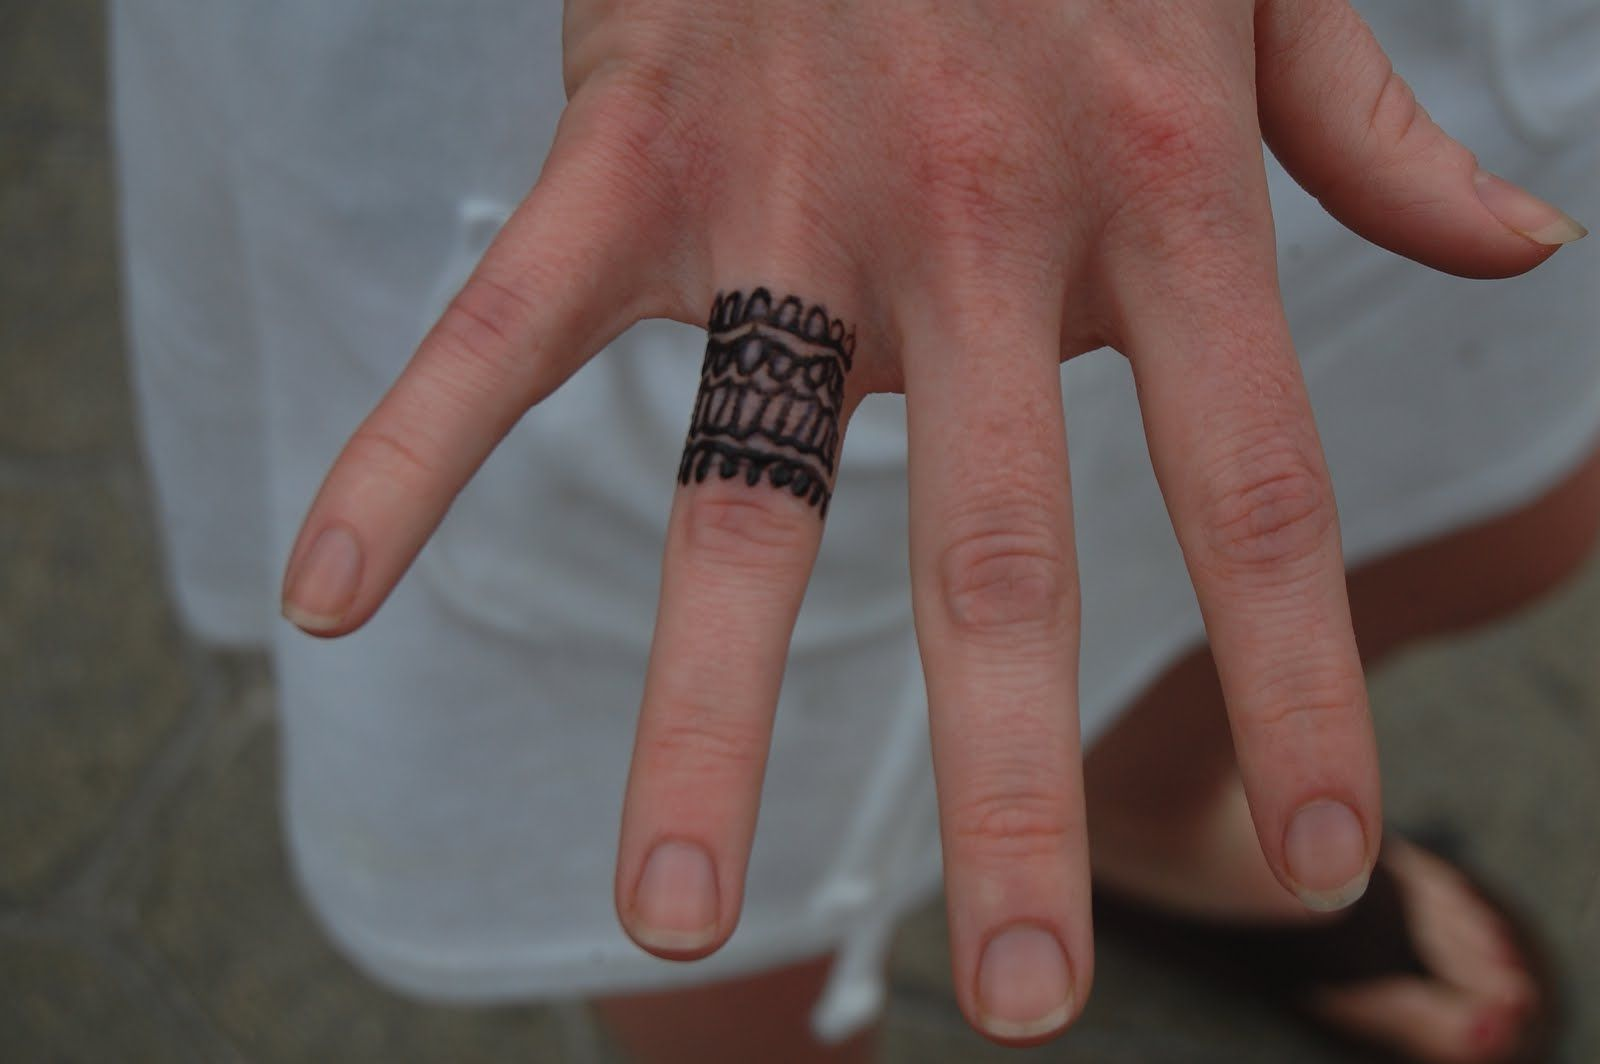 Wedding Ring 2016 also Wedding Ring Tattoo in Wedding Ring Tattoos